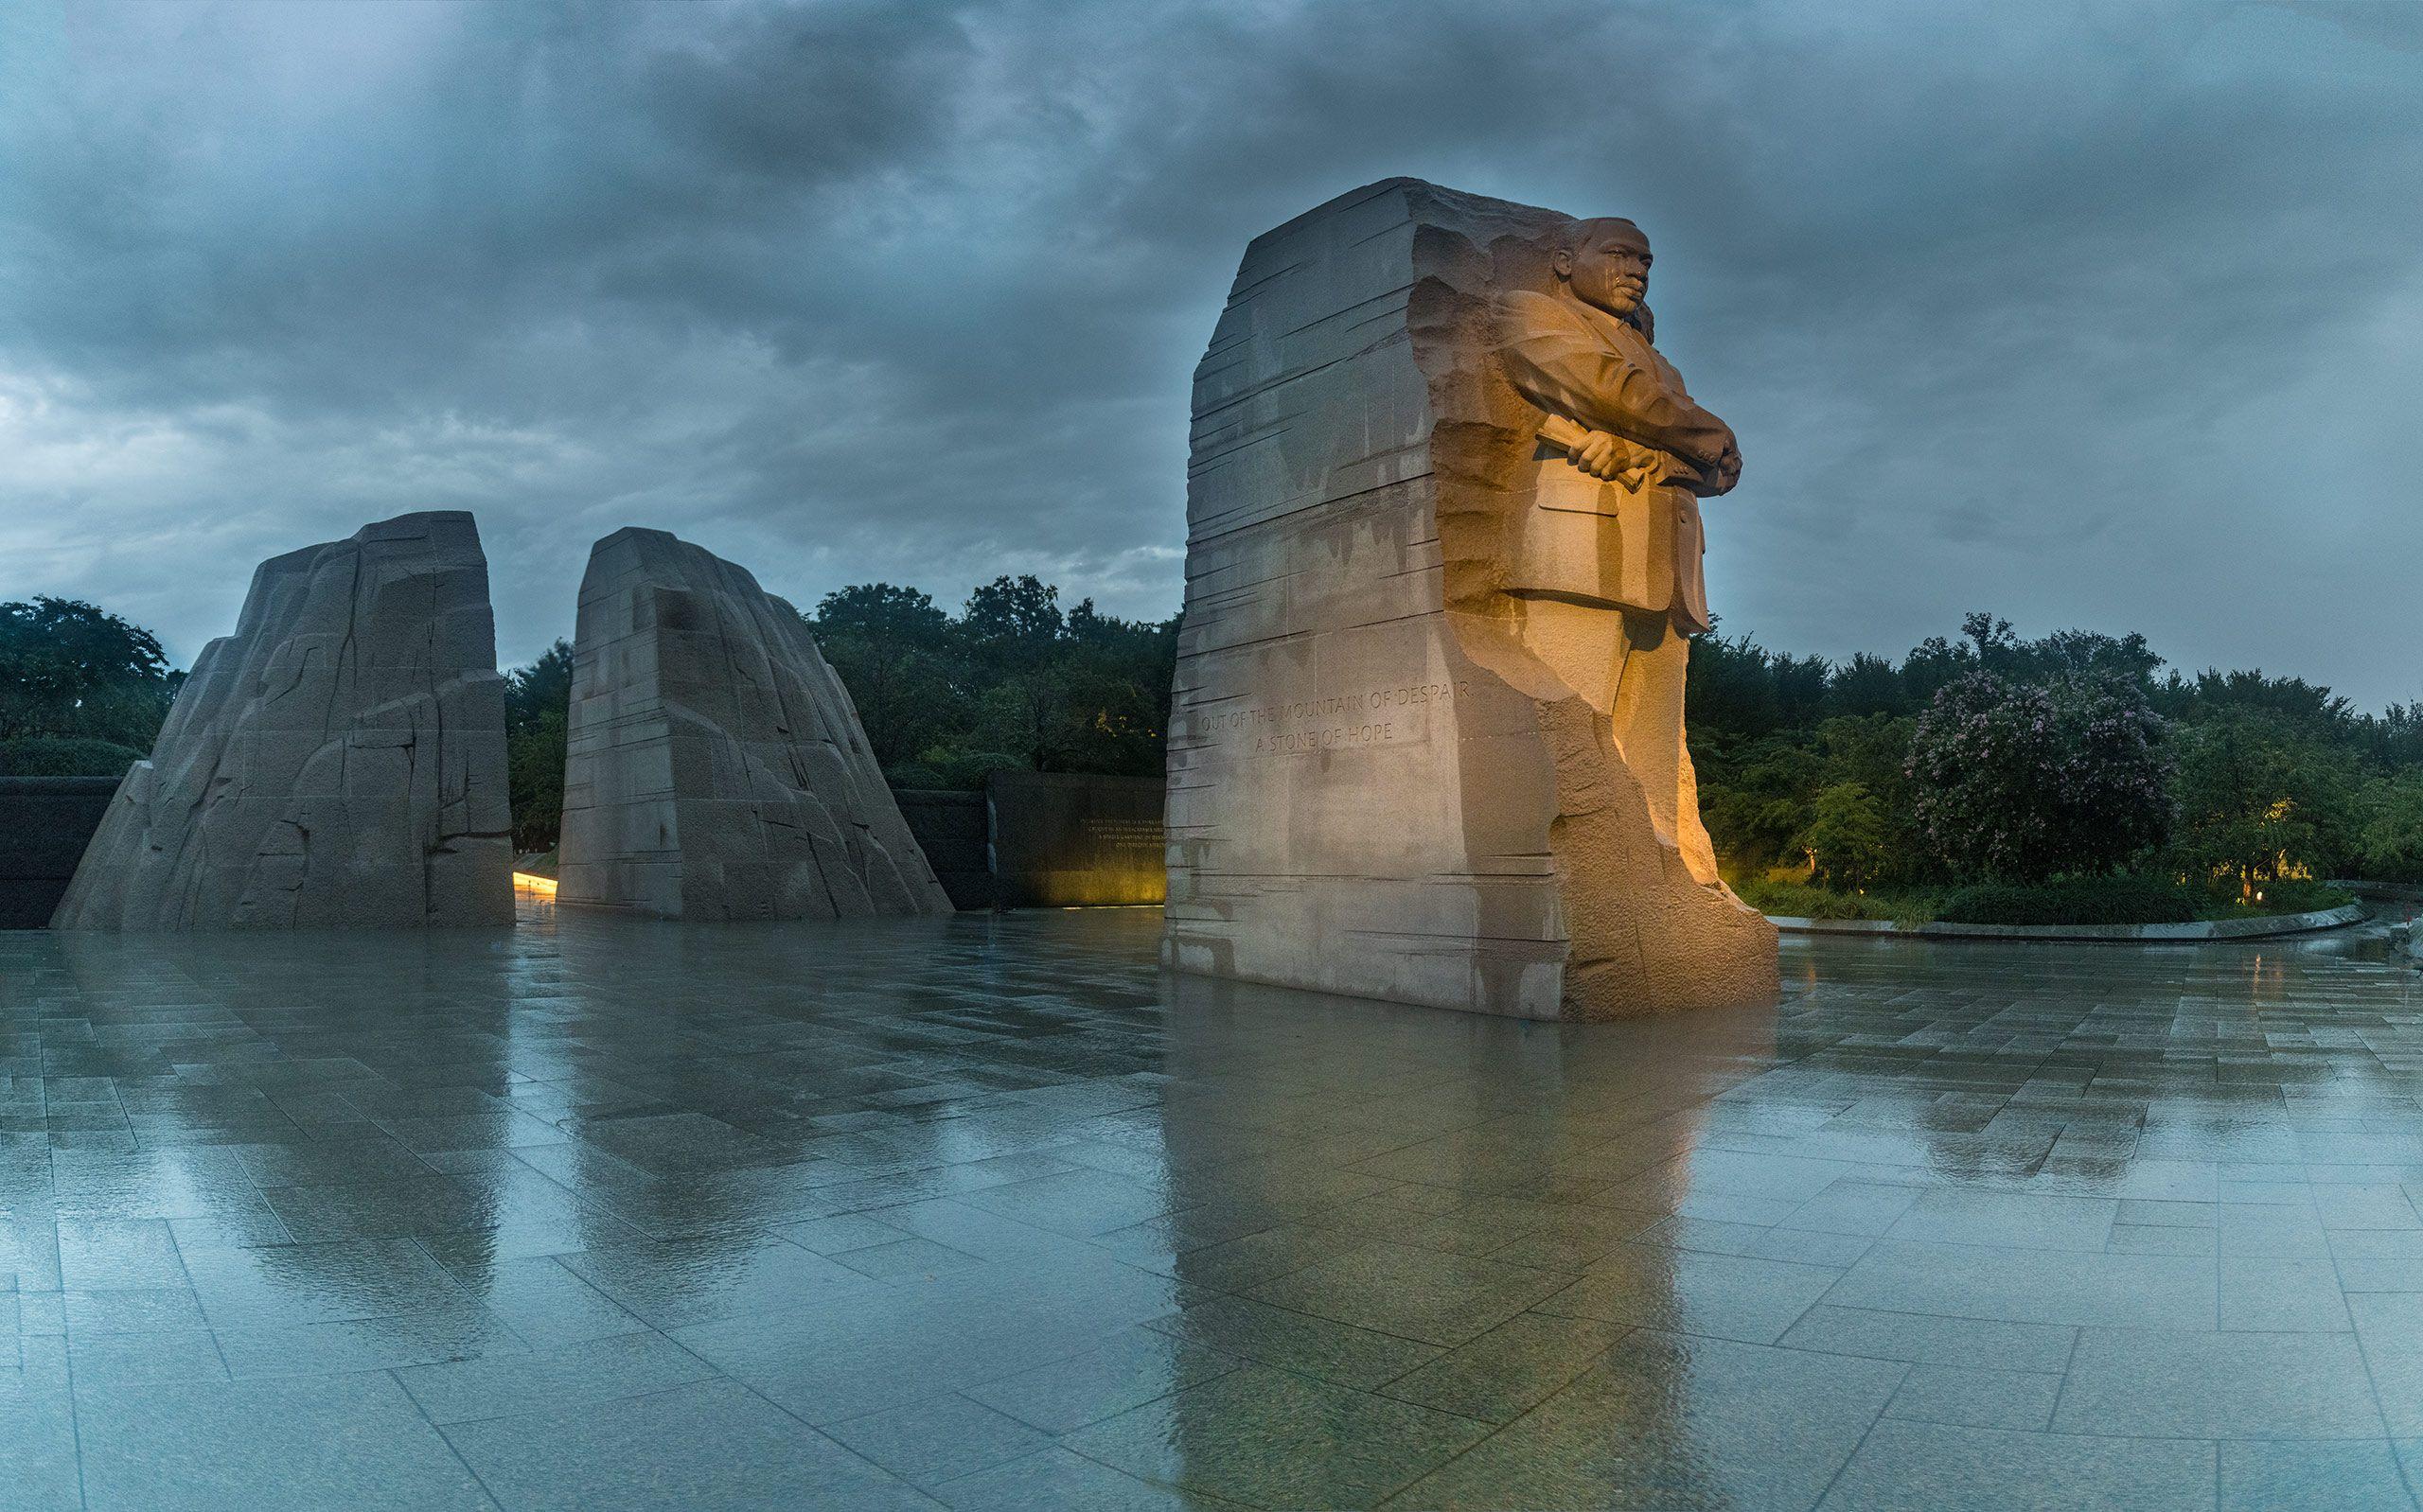 D-20-08-28-9531_38-Pano-(MLK-Memorial).jpg